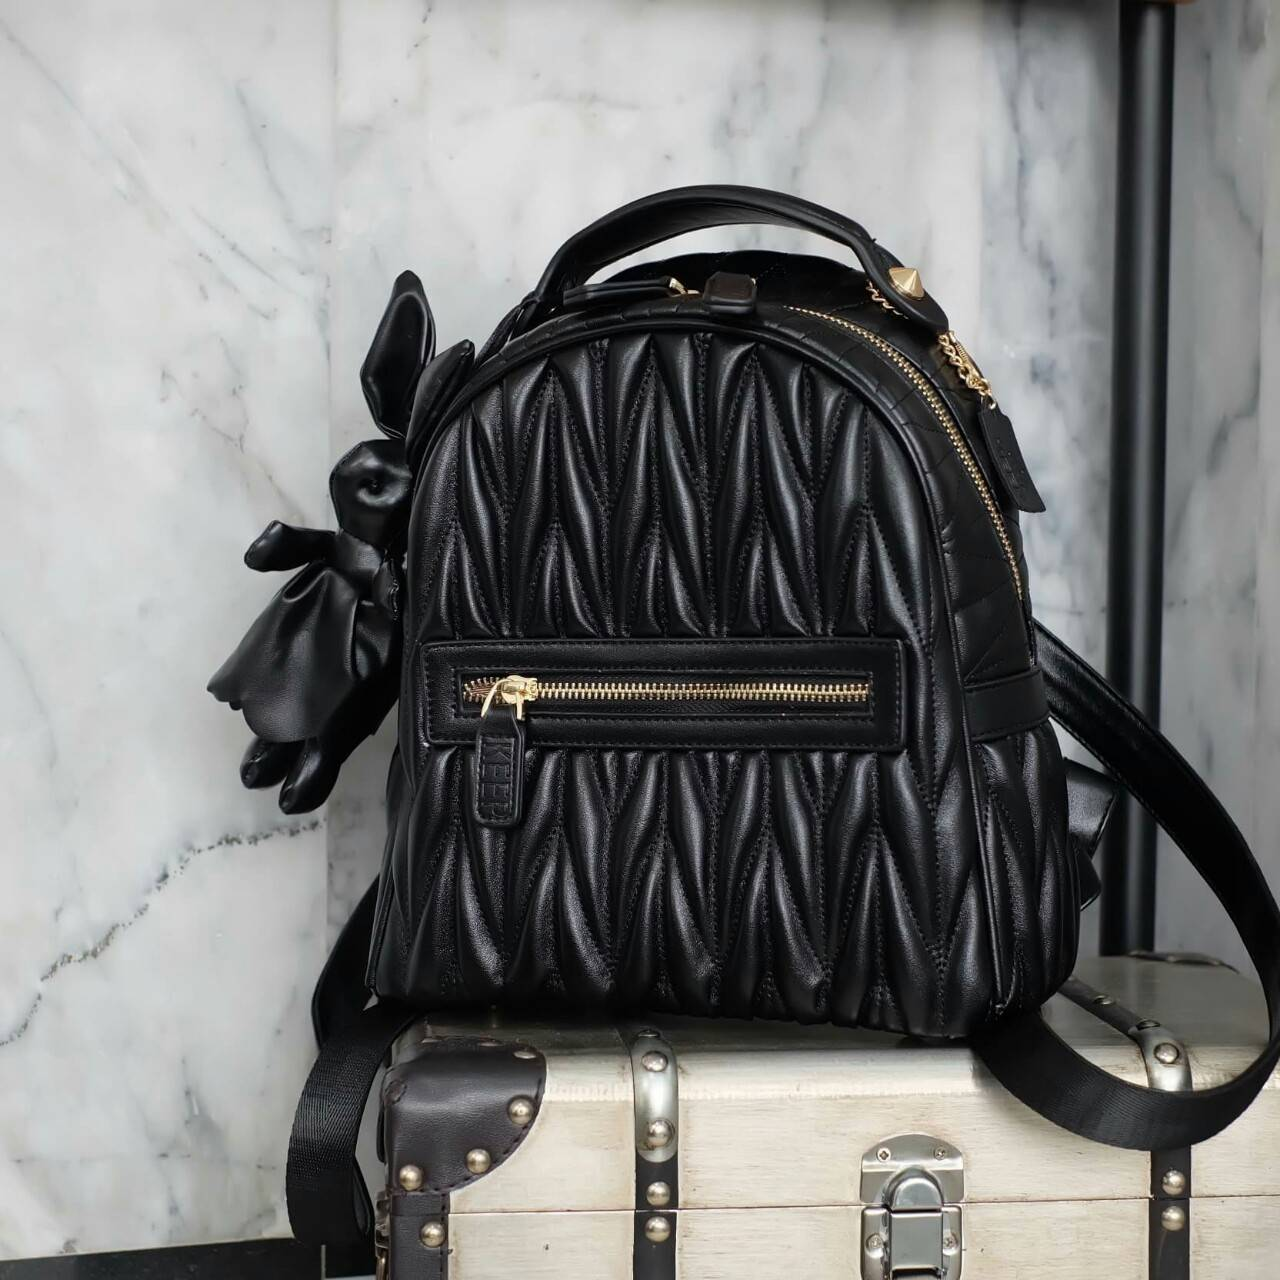 KEEP genuine Leather Mini Chic Backpack Classy Black #ใบนี้หนังแท้เลยค่ะ